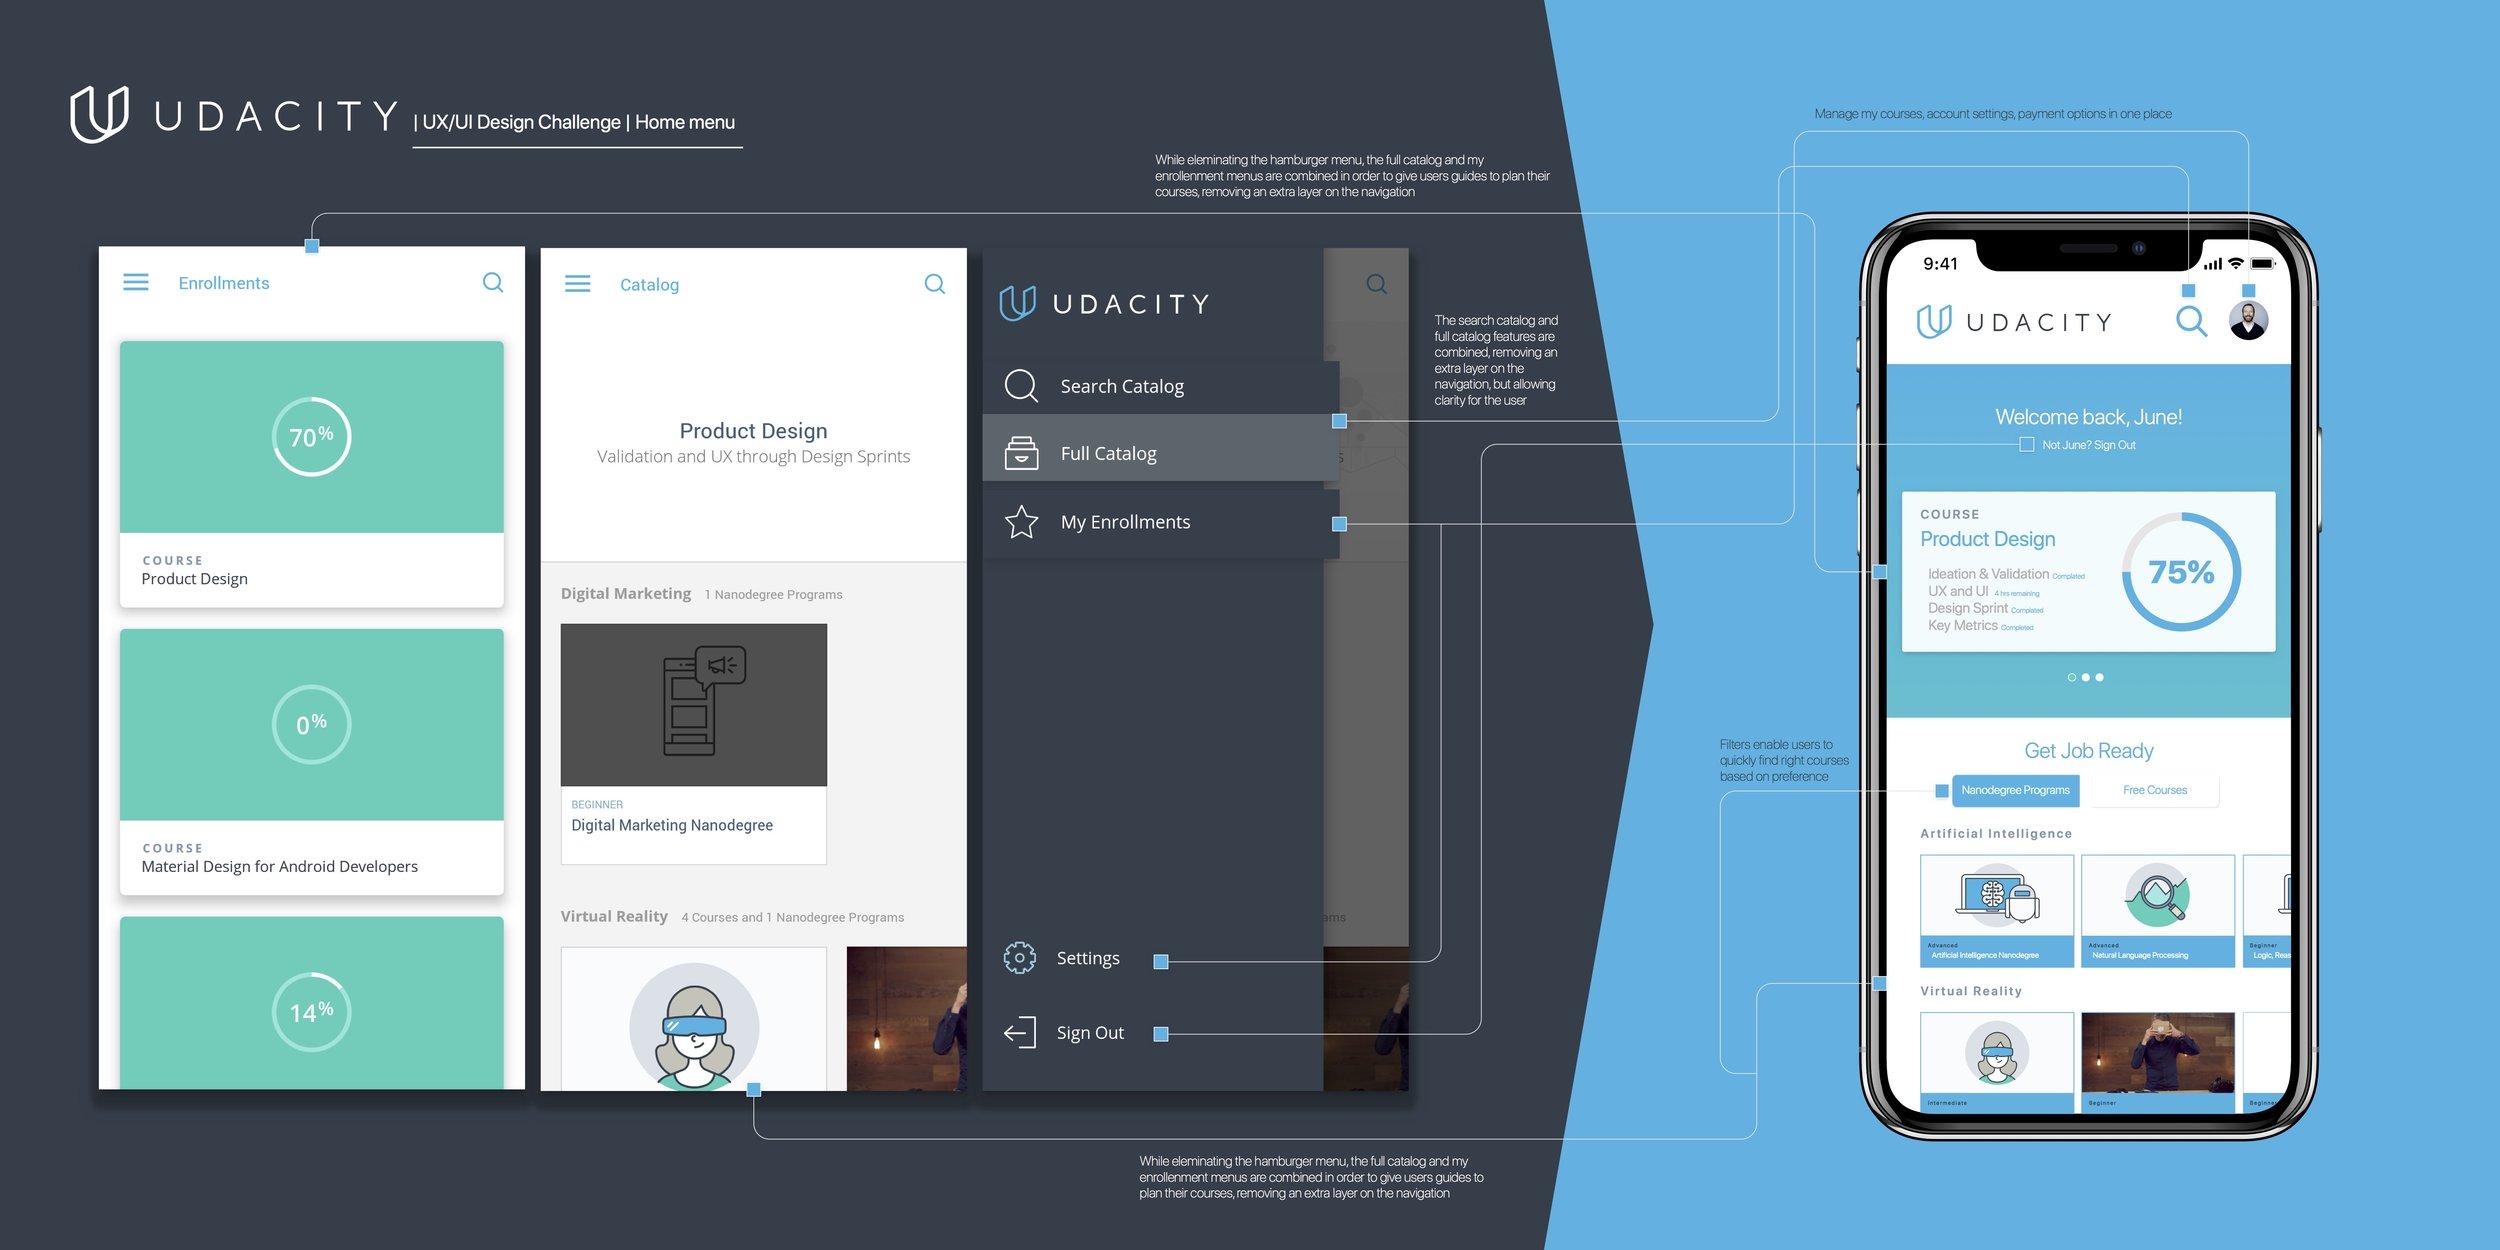 [UX/UI Design]     UX/UI challenge  to flex my problem-solving muscles